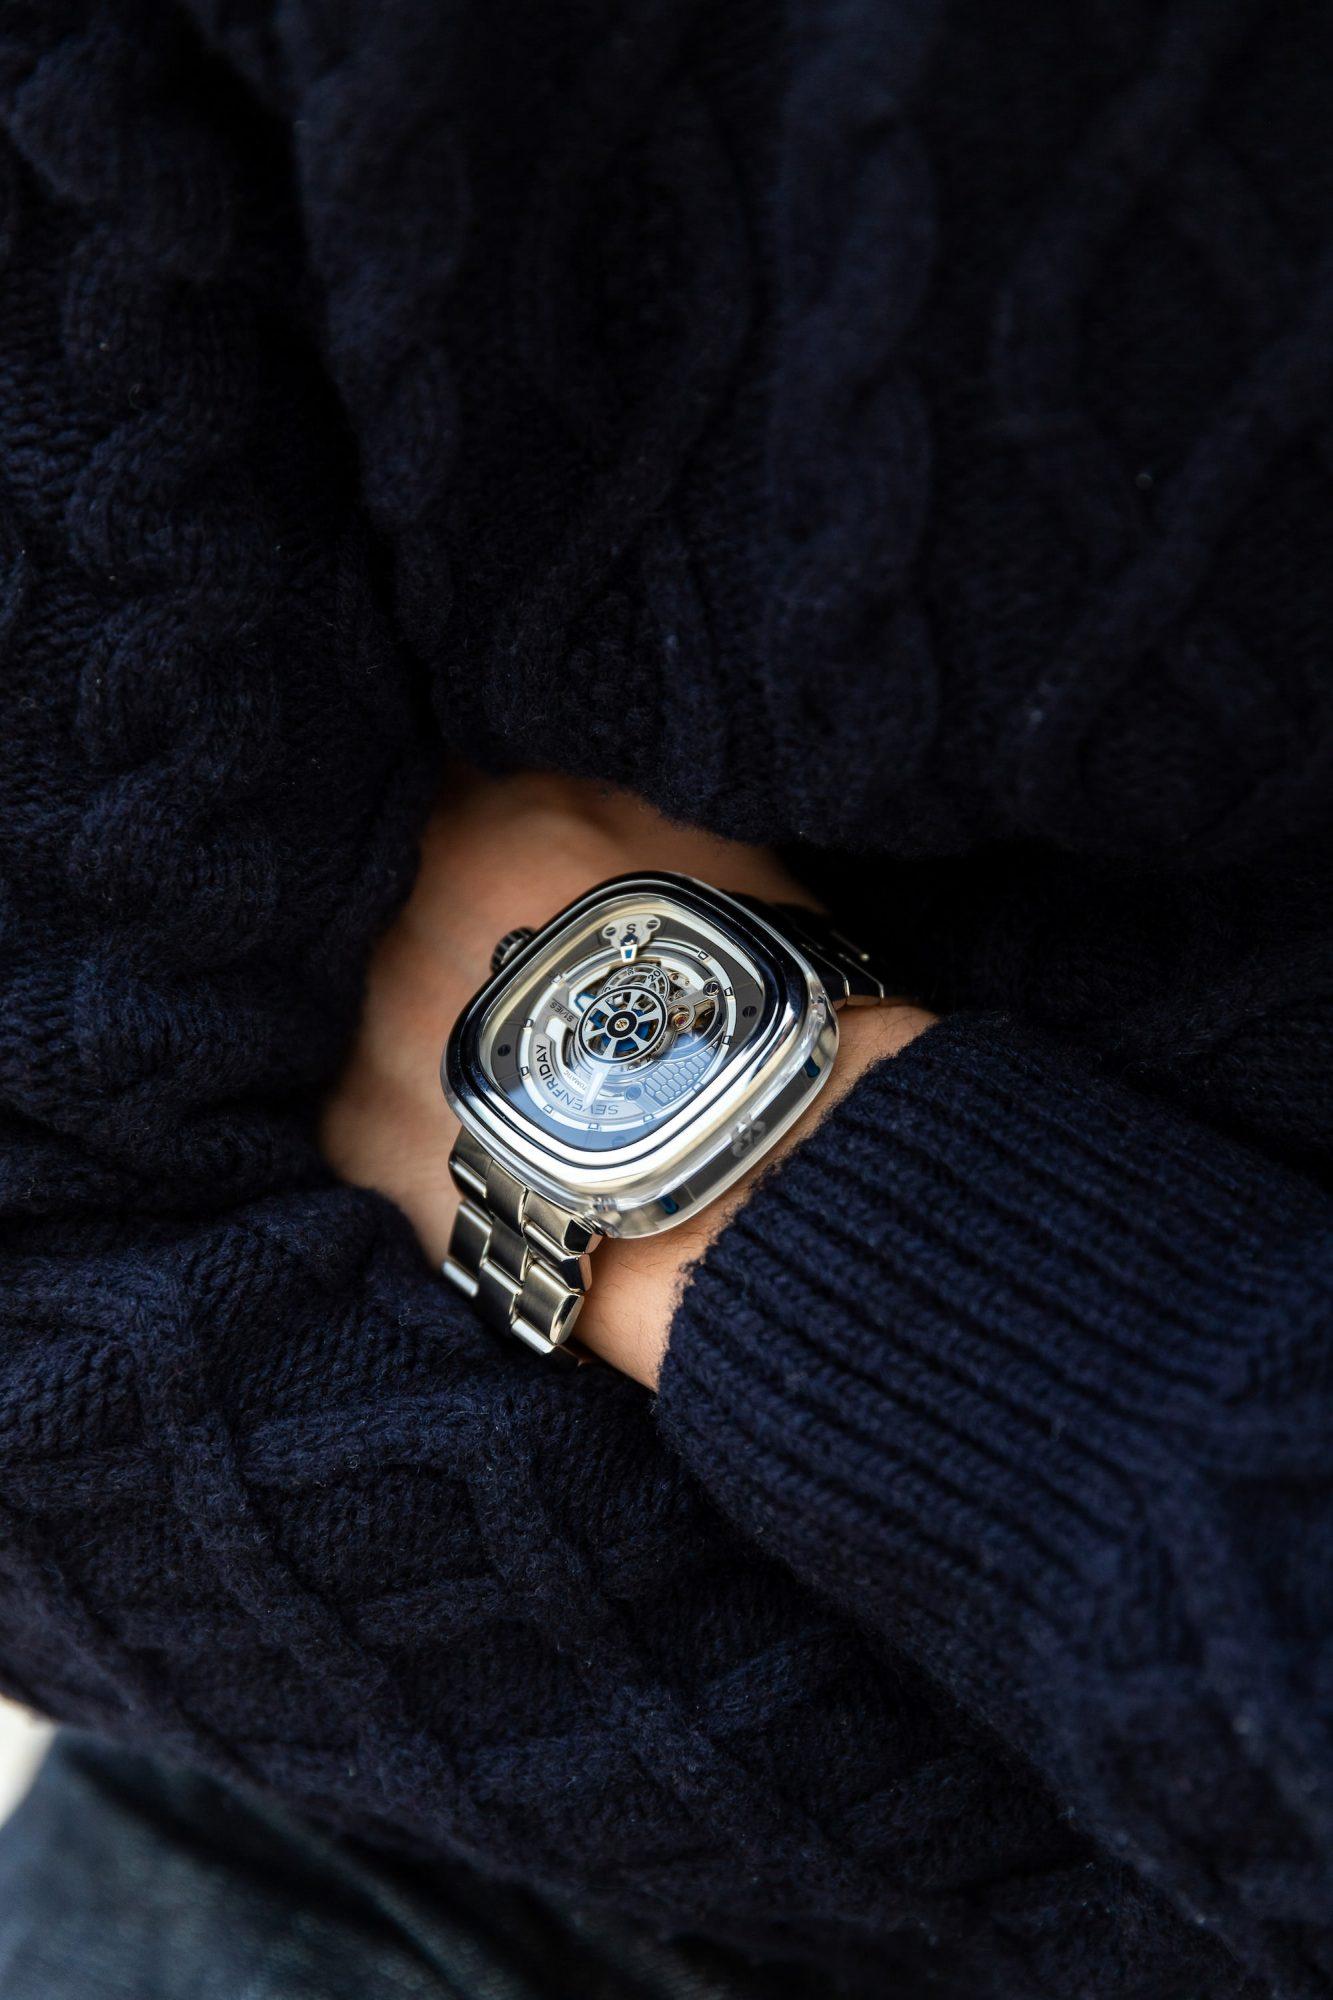 S-Series S1:01M Sevenfriday montre